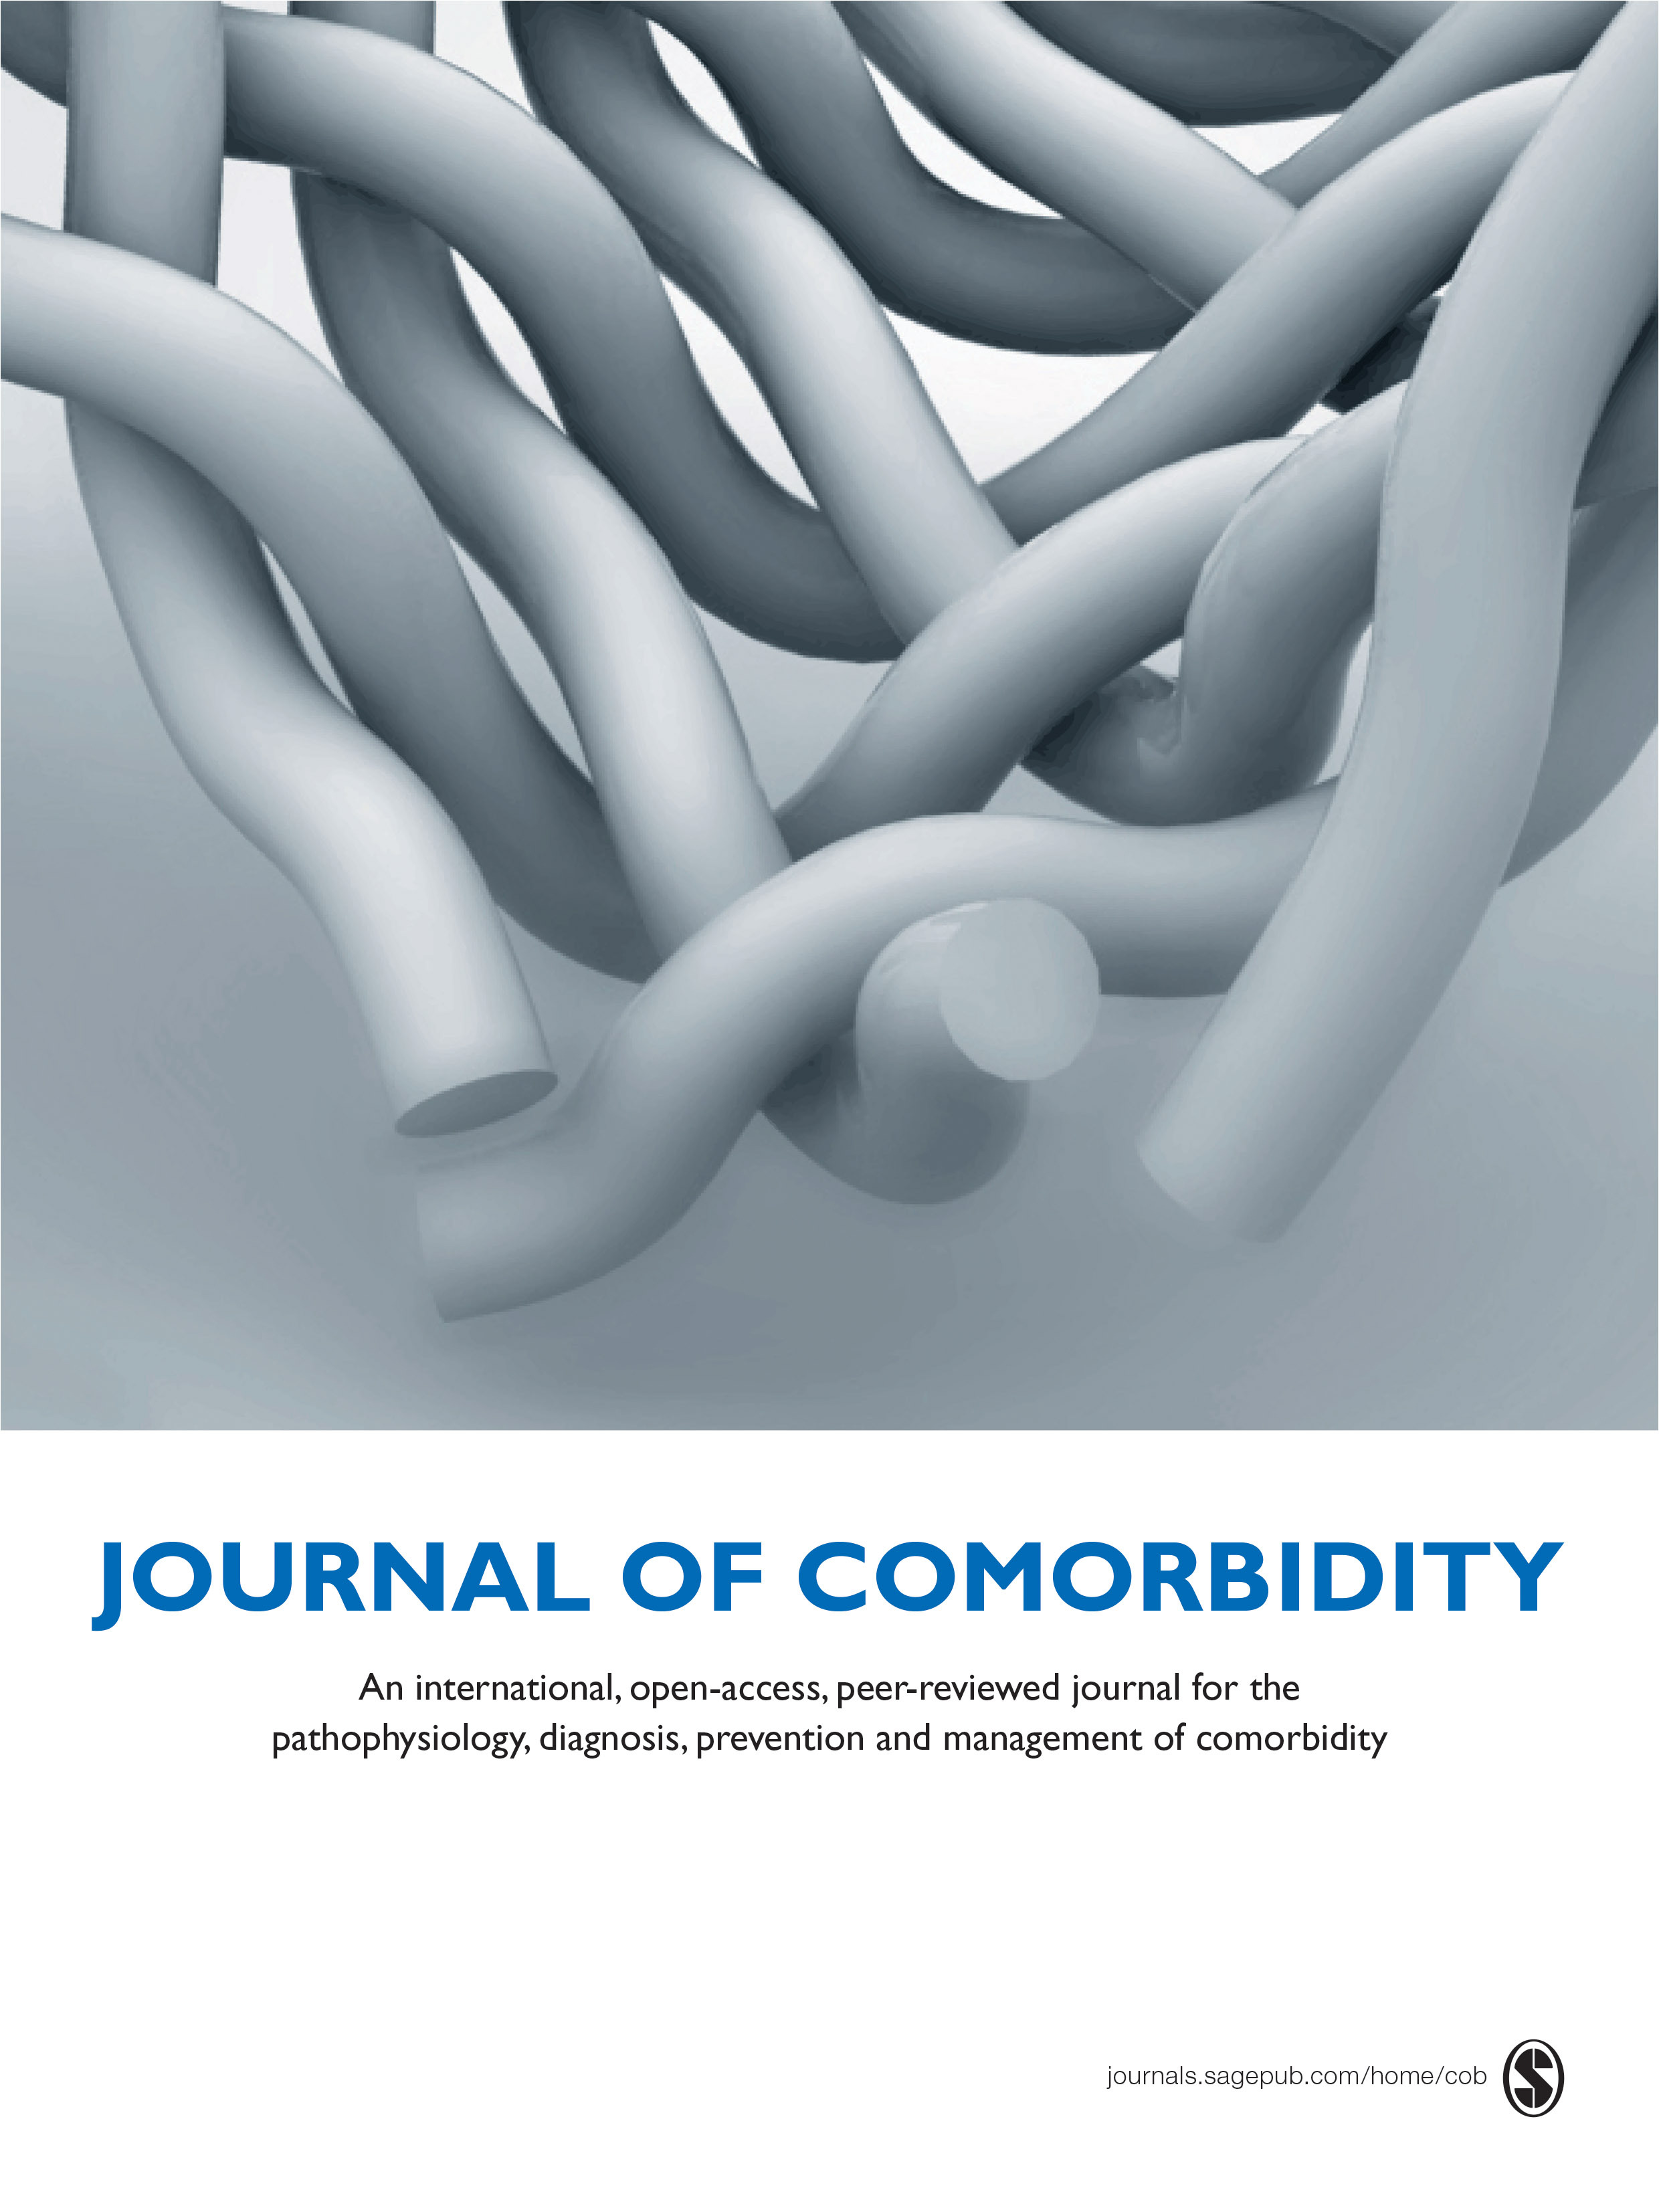 Journal of Comorbidity